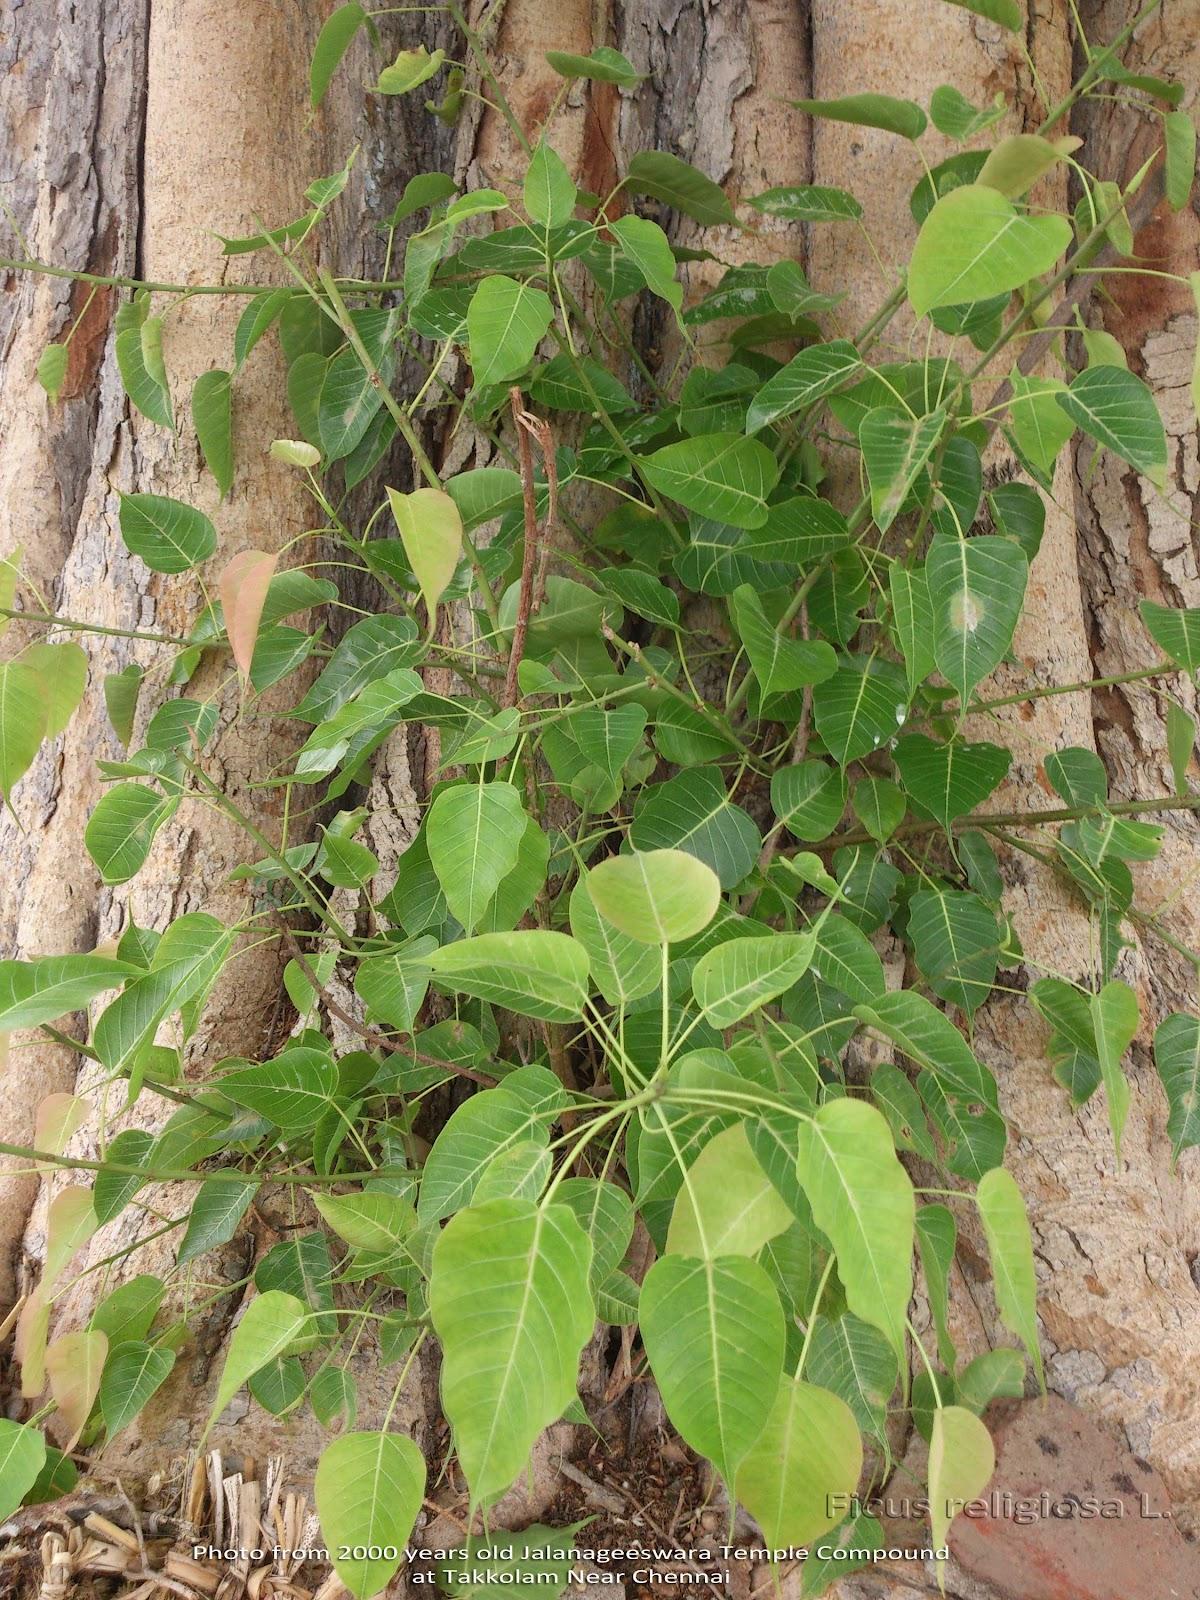 http://1.bp.blogspot.com/-59d2frV2XgE/T_CGa-OnrlI/AAAAAAAADqs/dc7CCs-eeJc/s1600/Ficus-religiosa-Pipal-ashwattha-Ravi-chettu-Bodhi-Vriksh--Arasa-maram.jpg